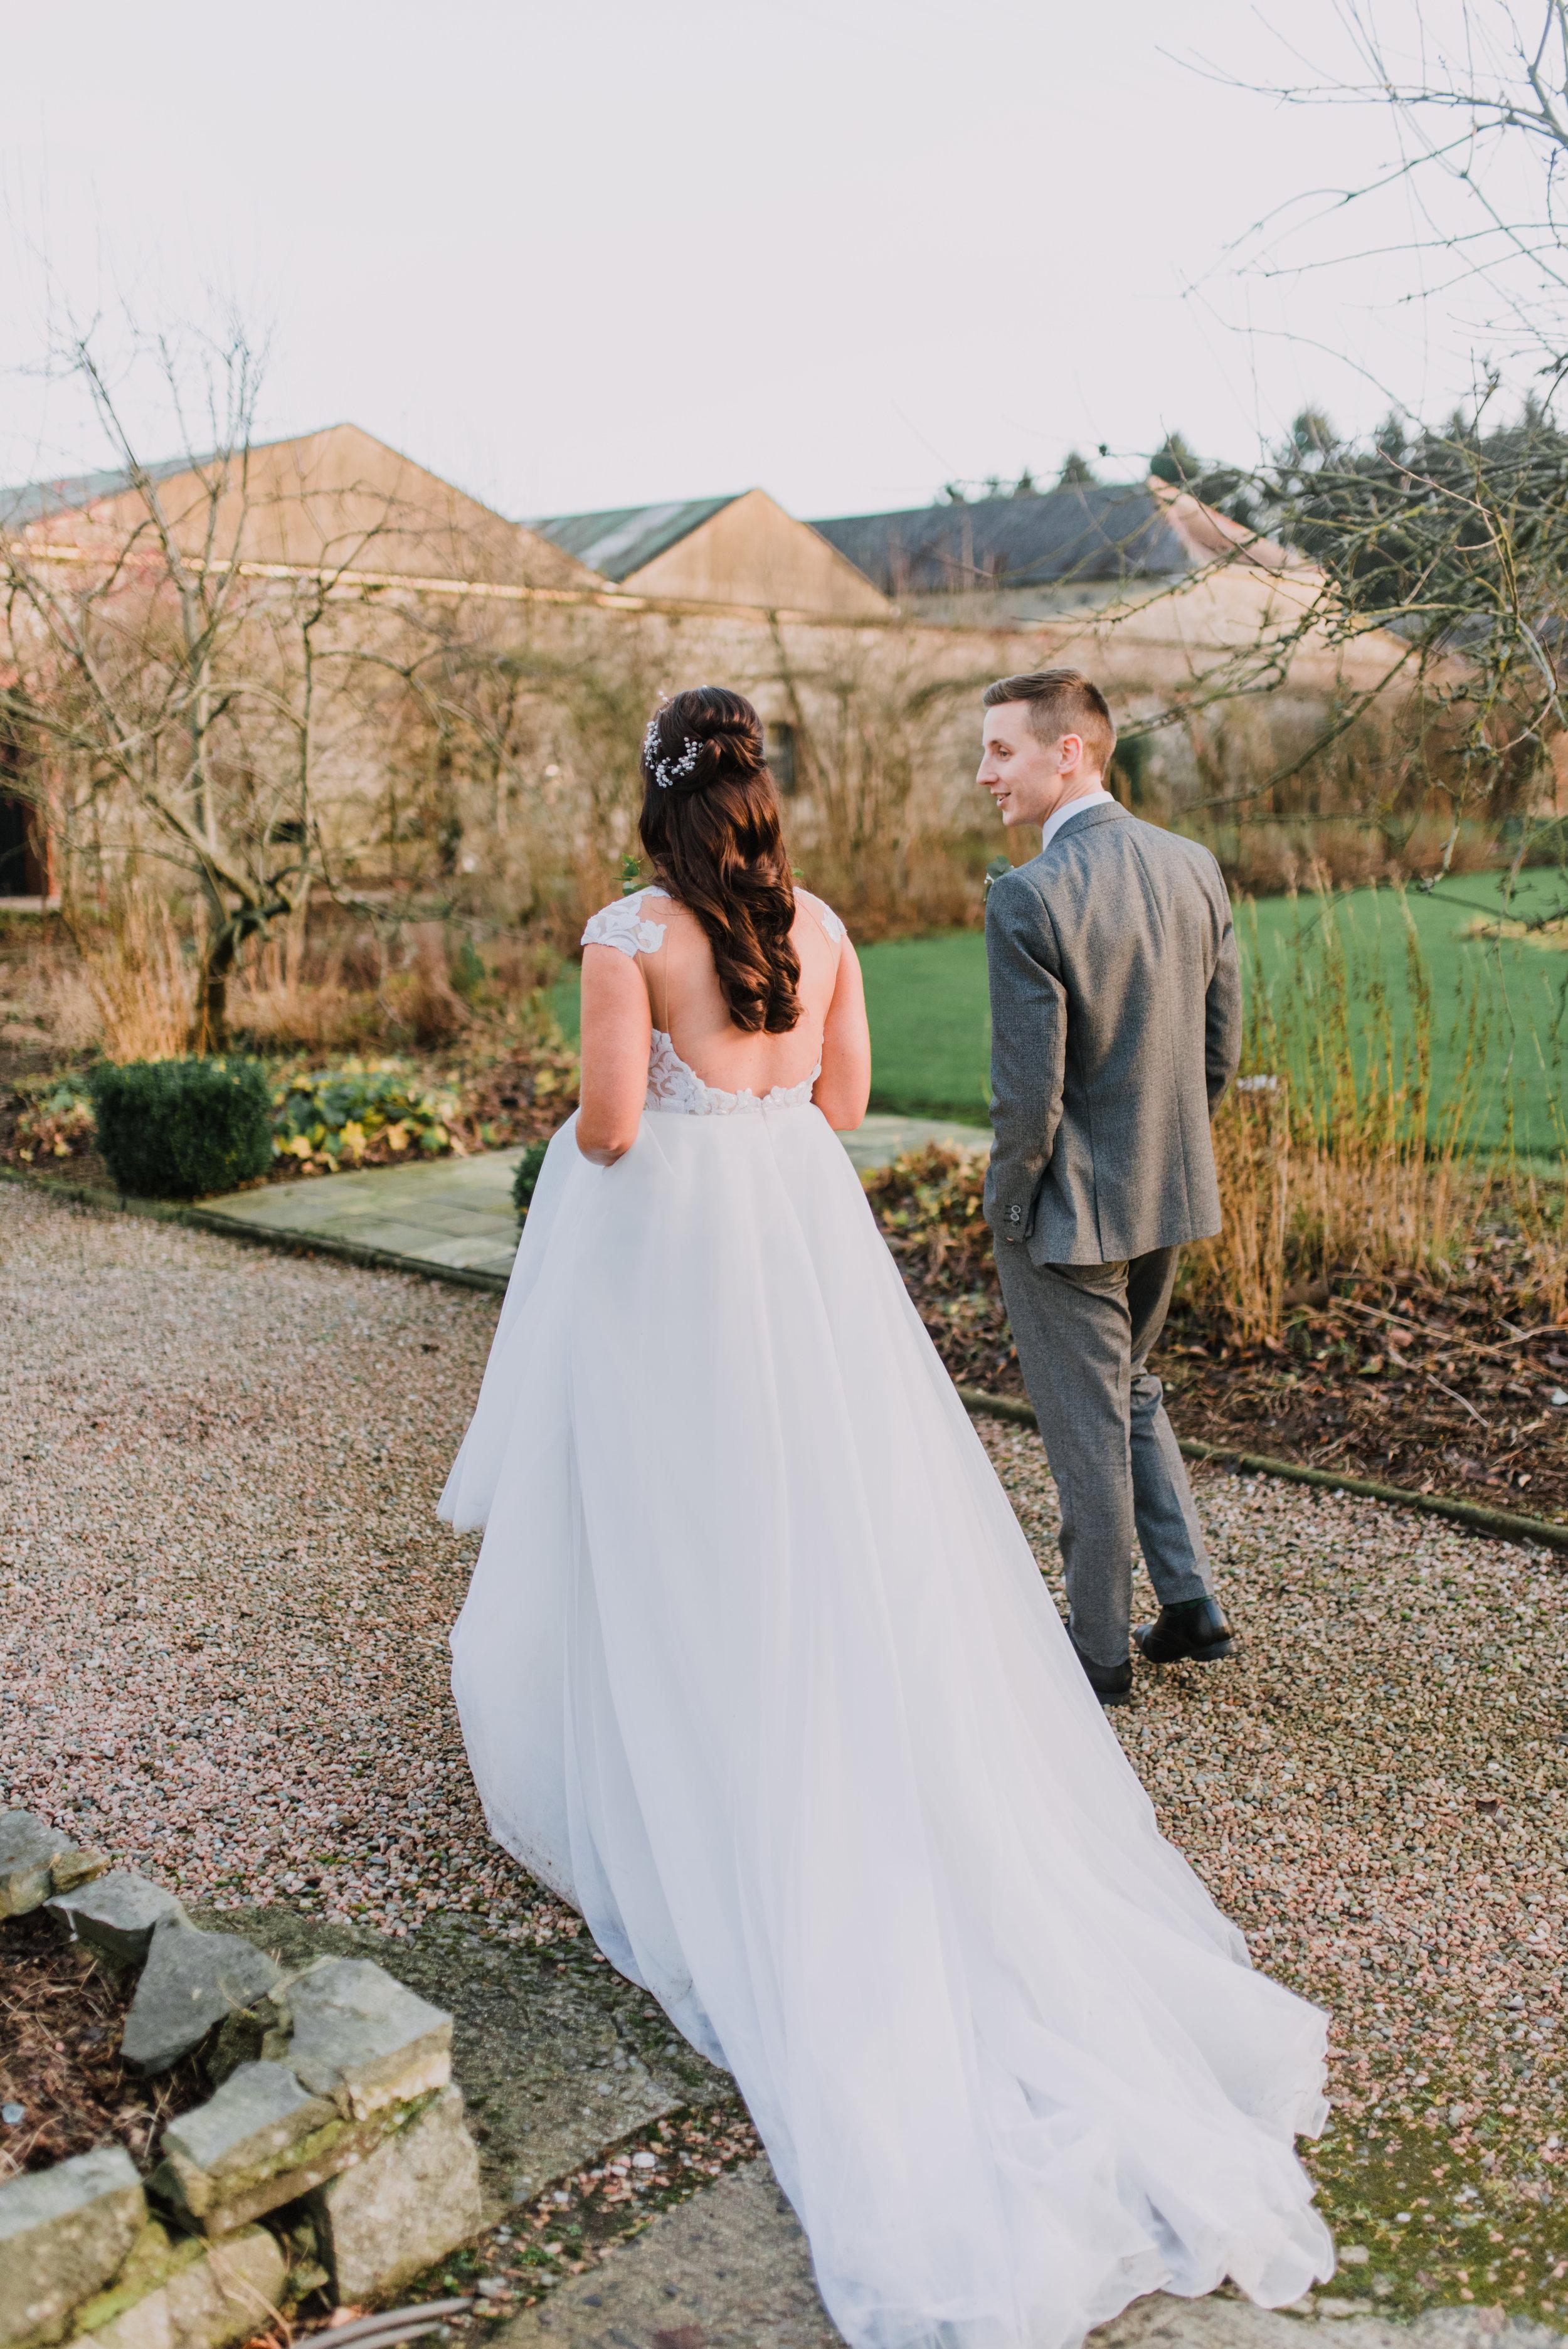 larchfield estate wedding, wedding venues northern ireland, barn wedding venues northern ireland, quirky weddings ni, wedding photos larchfield estate, shane todd wedding, best wedding venues n (5).jpg